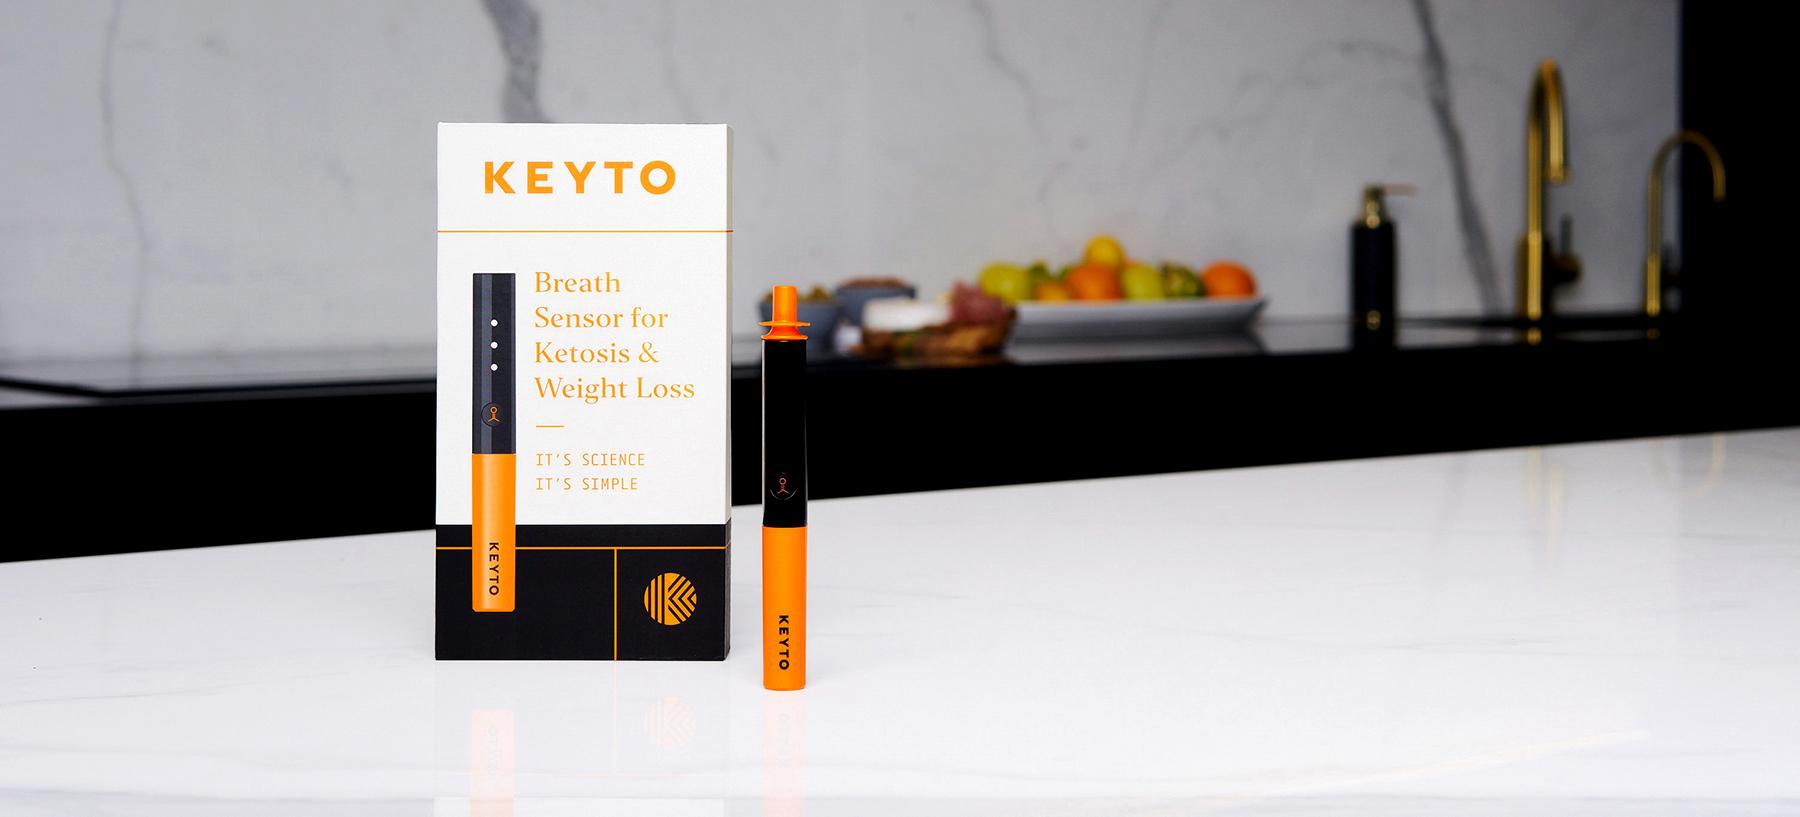 Keyto Breath Sensor